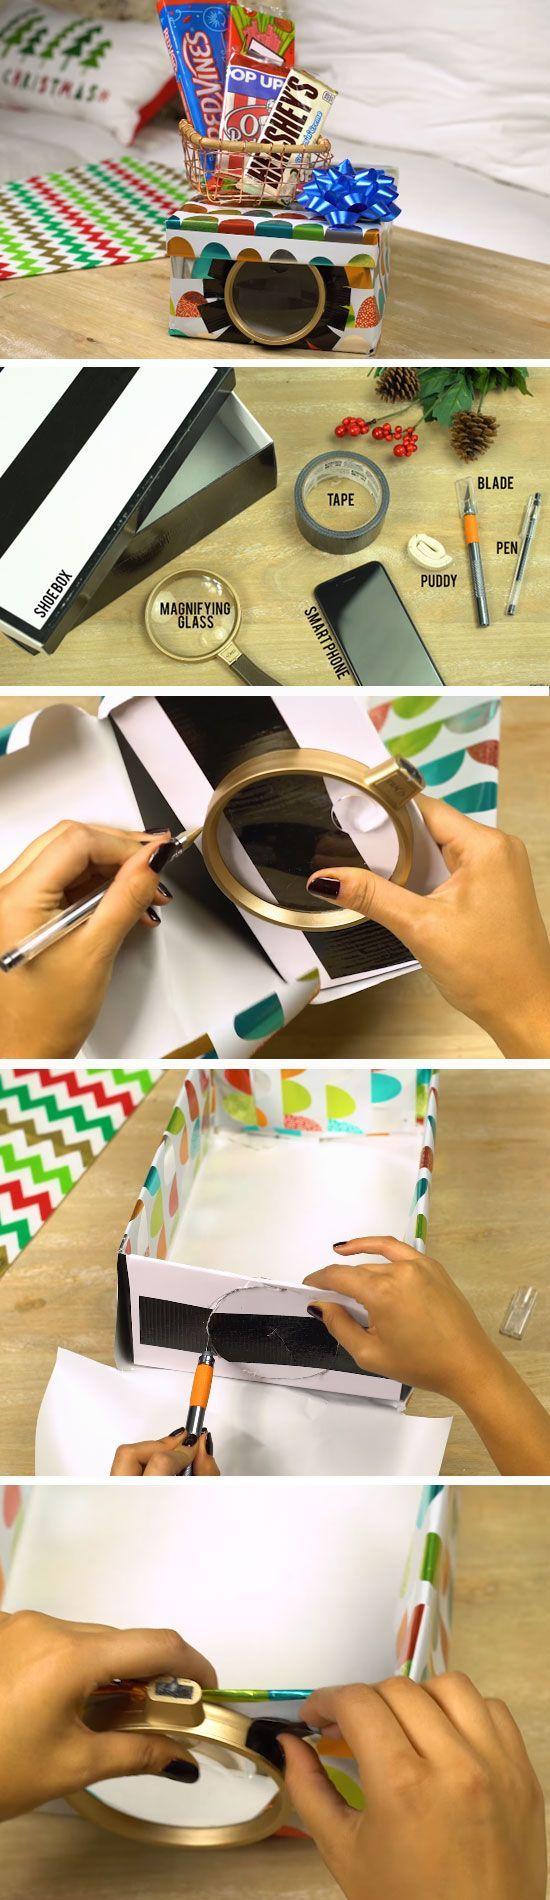 Smartphone Projector | Christmas Gifts for Boyfriend DIY Cute #SmartphoneProjector